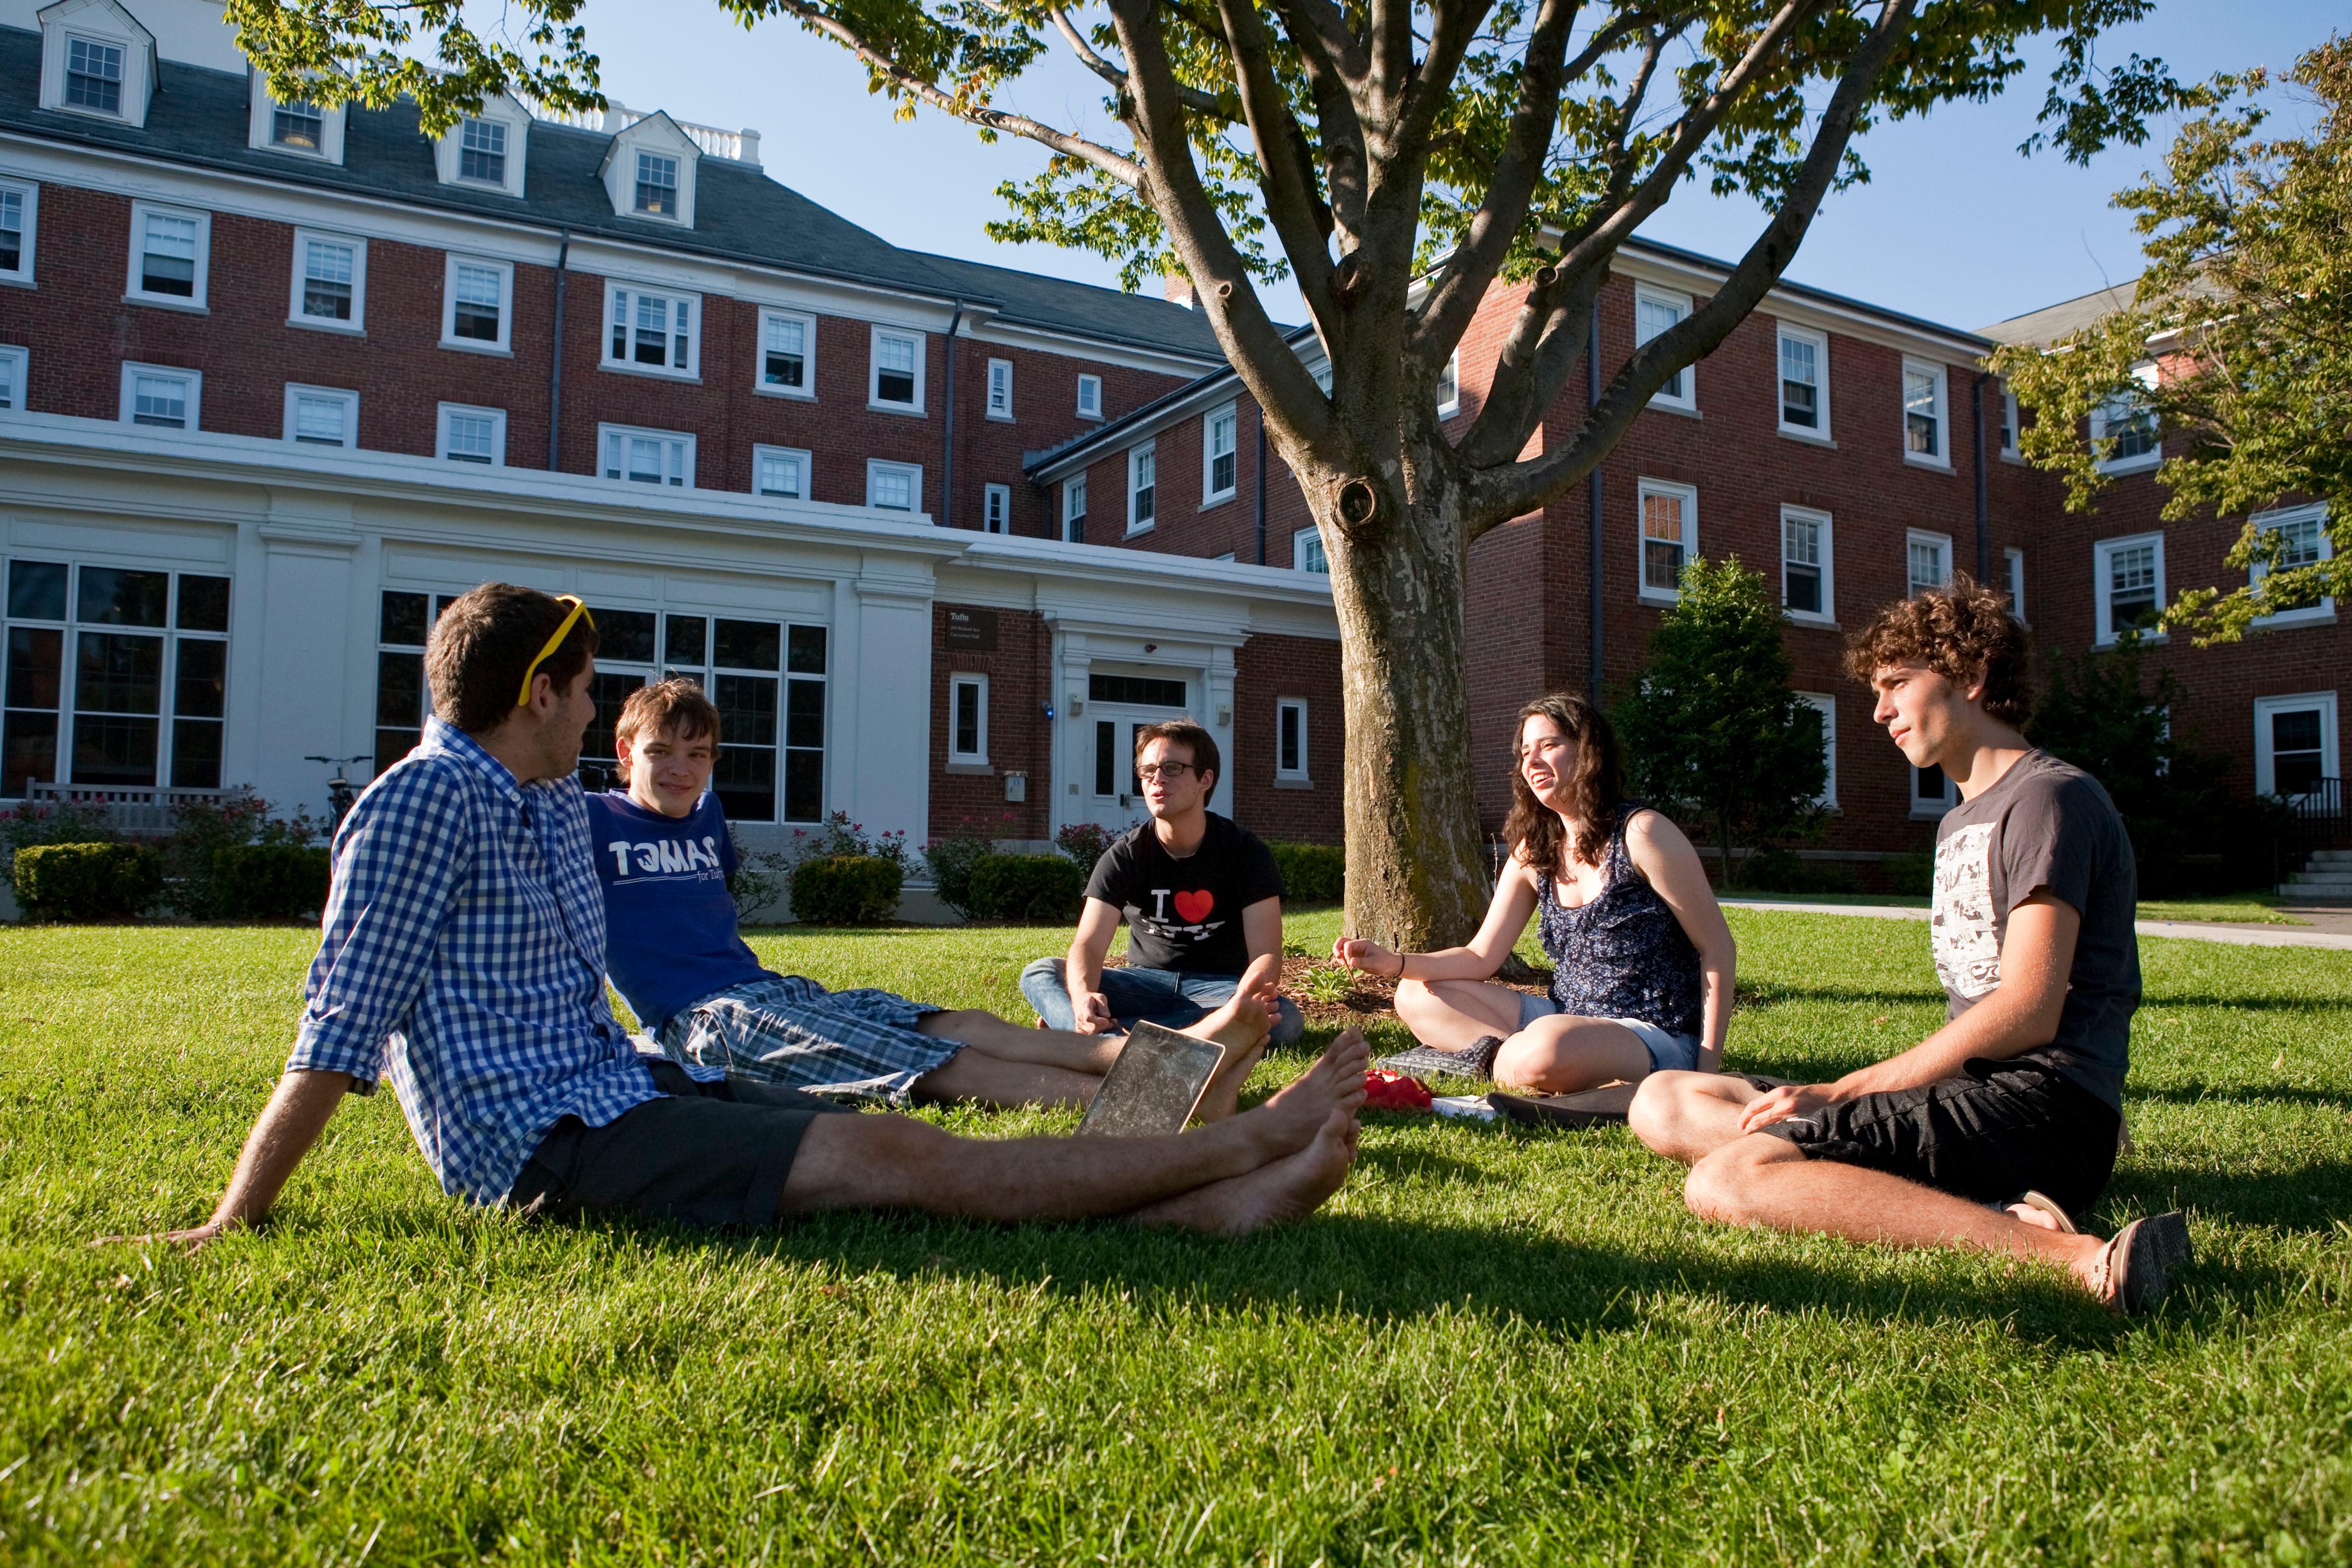 Tufts_University_Summer_on_the_Quad.jpg